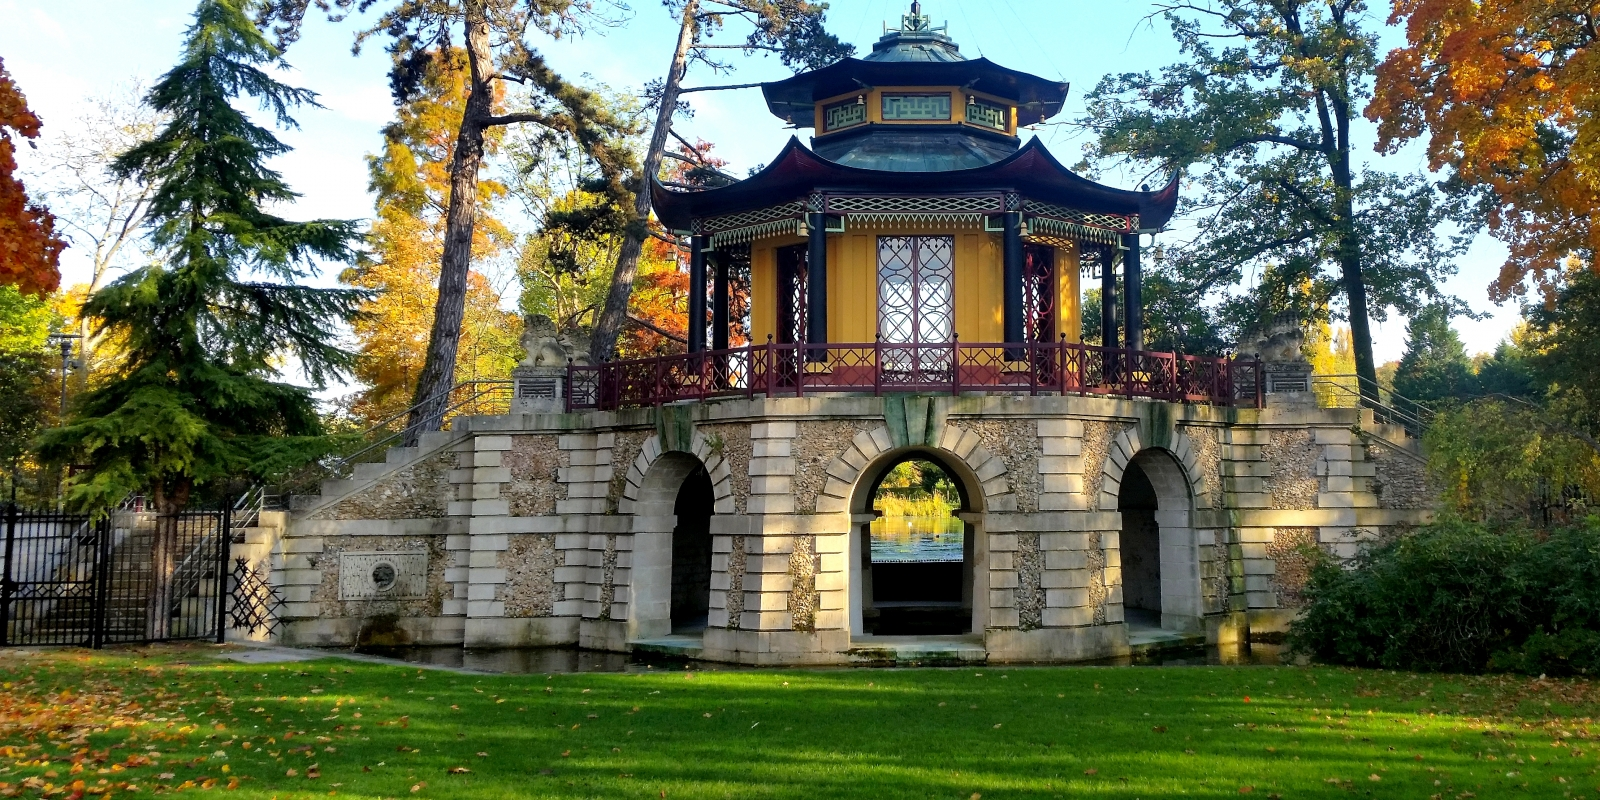 Pavillon Chinois de L'Isle-Adam pris au printemps